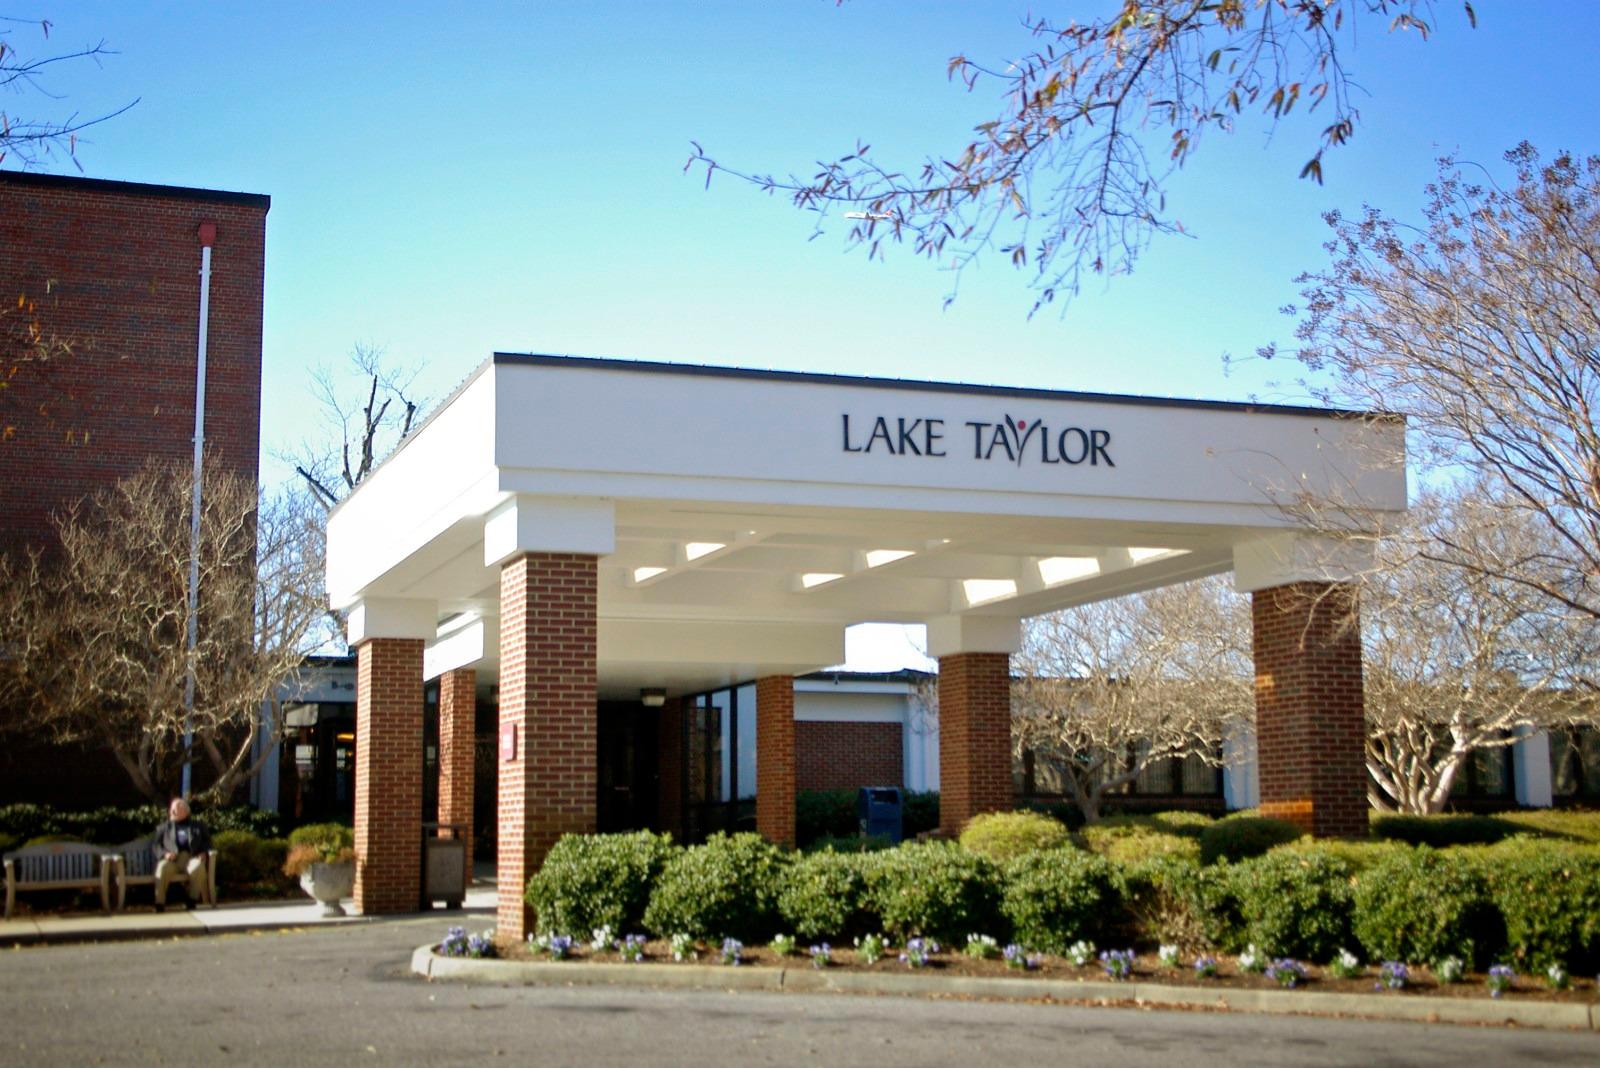 Lake Taylor Transitional Care Hospital Wikipedia